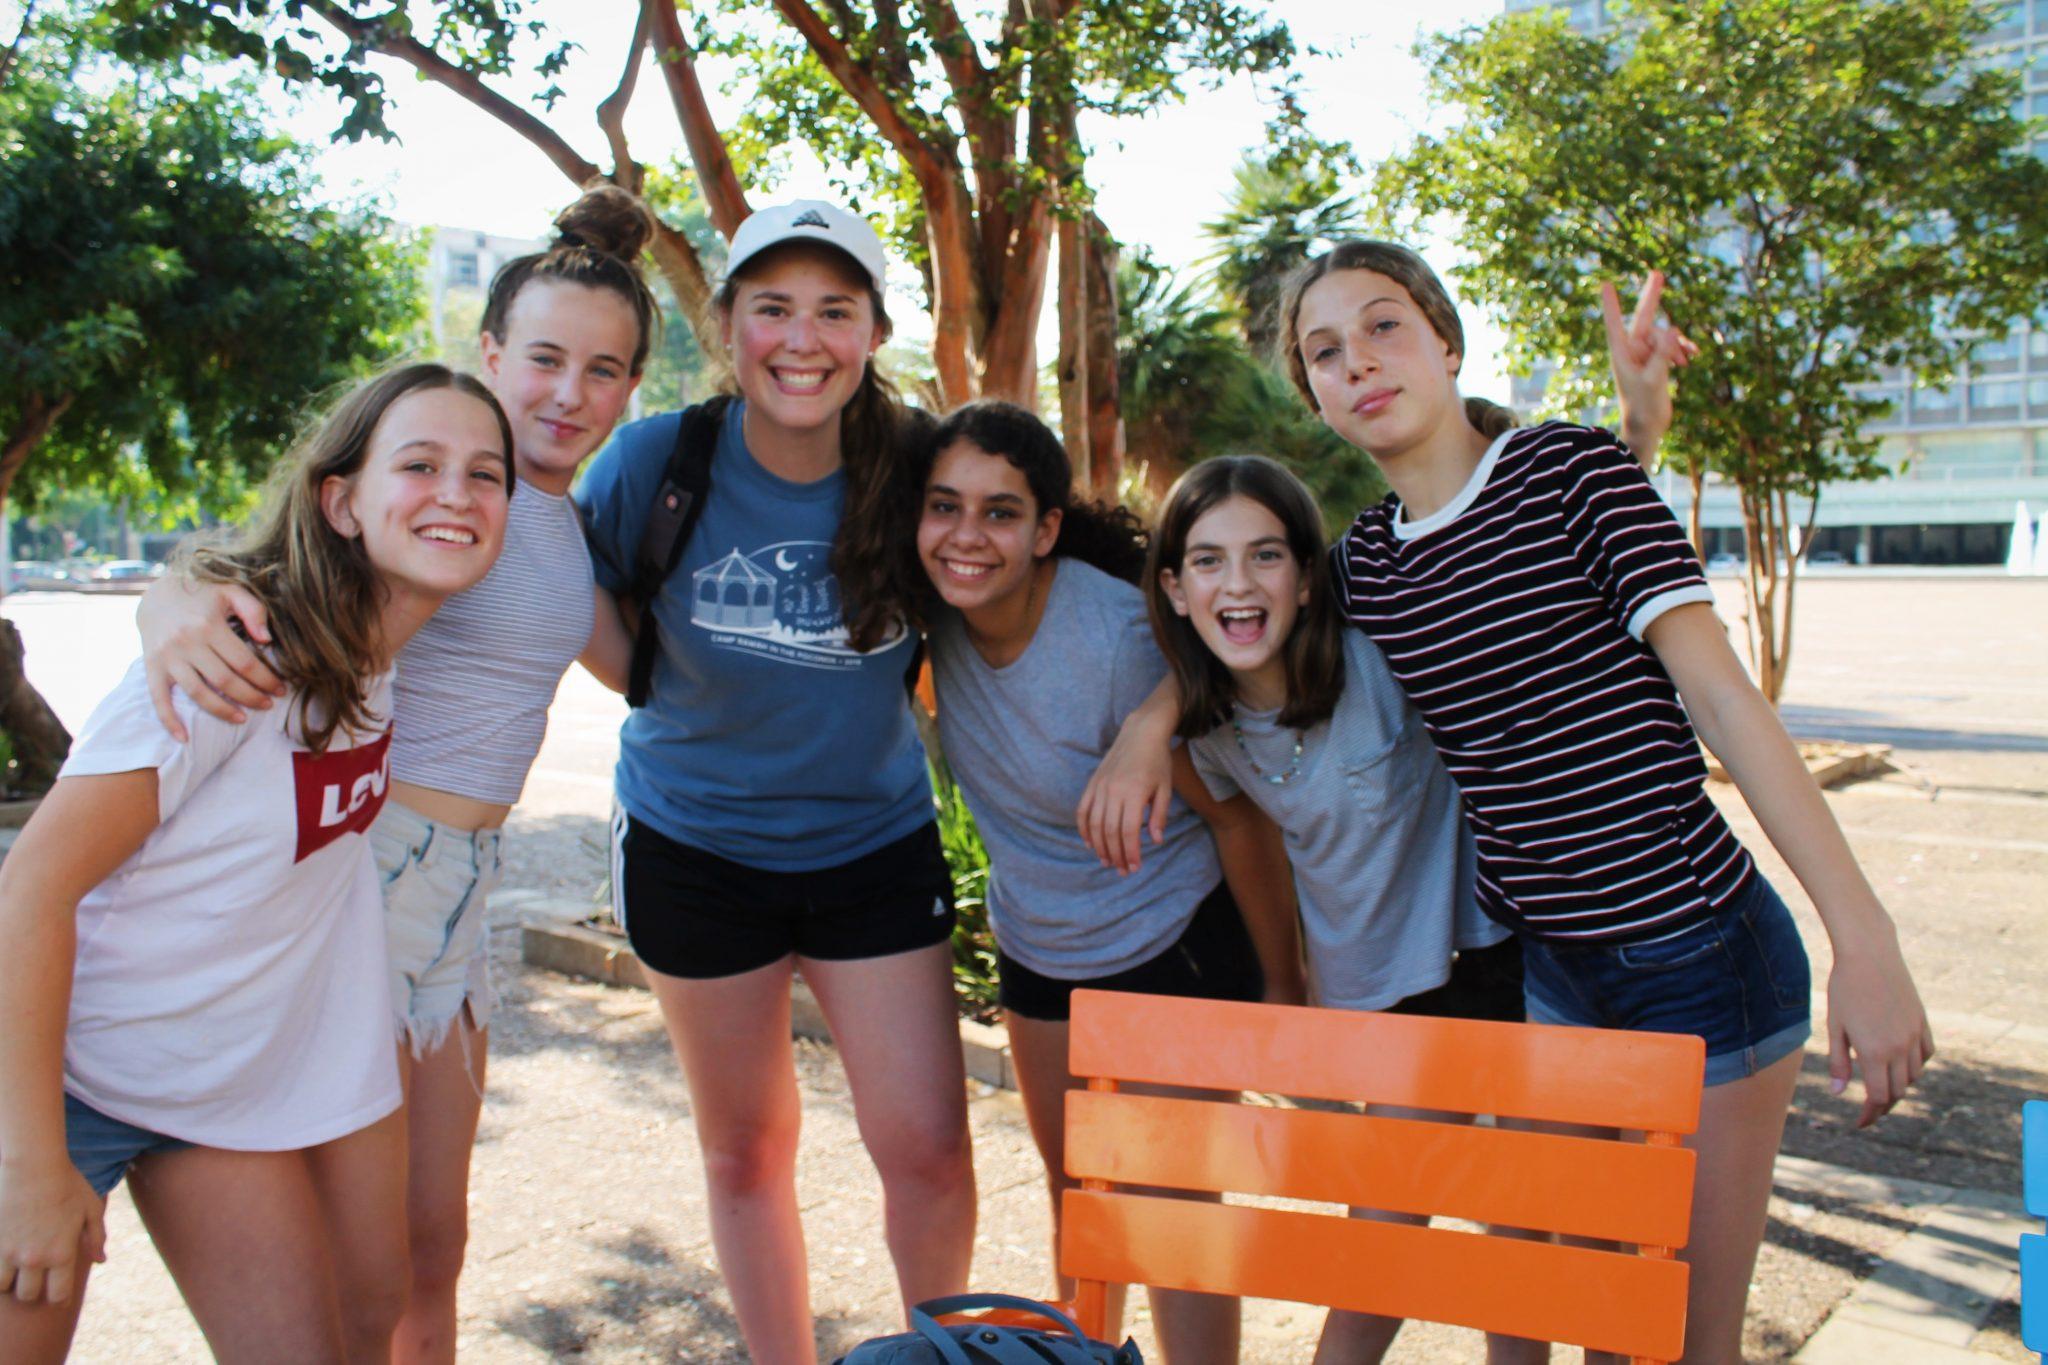 11 fab pics from ISRAEL21c's first photo internship - ISRAEL21c